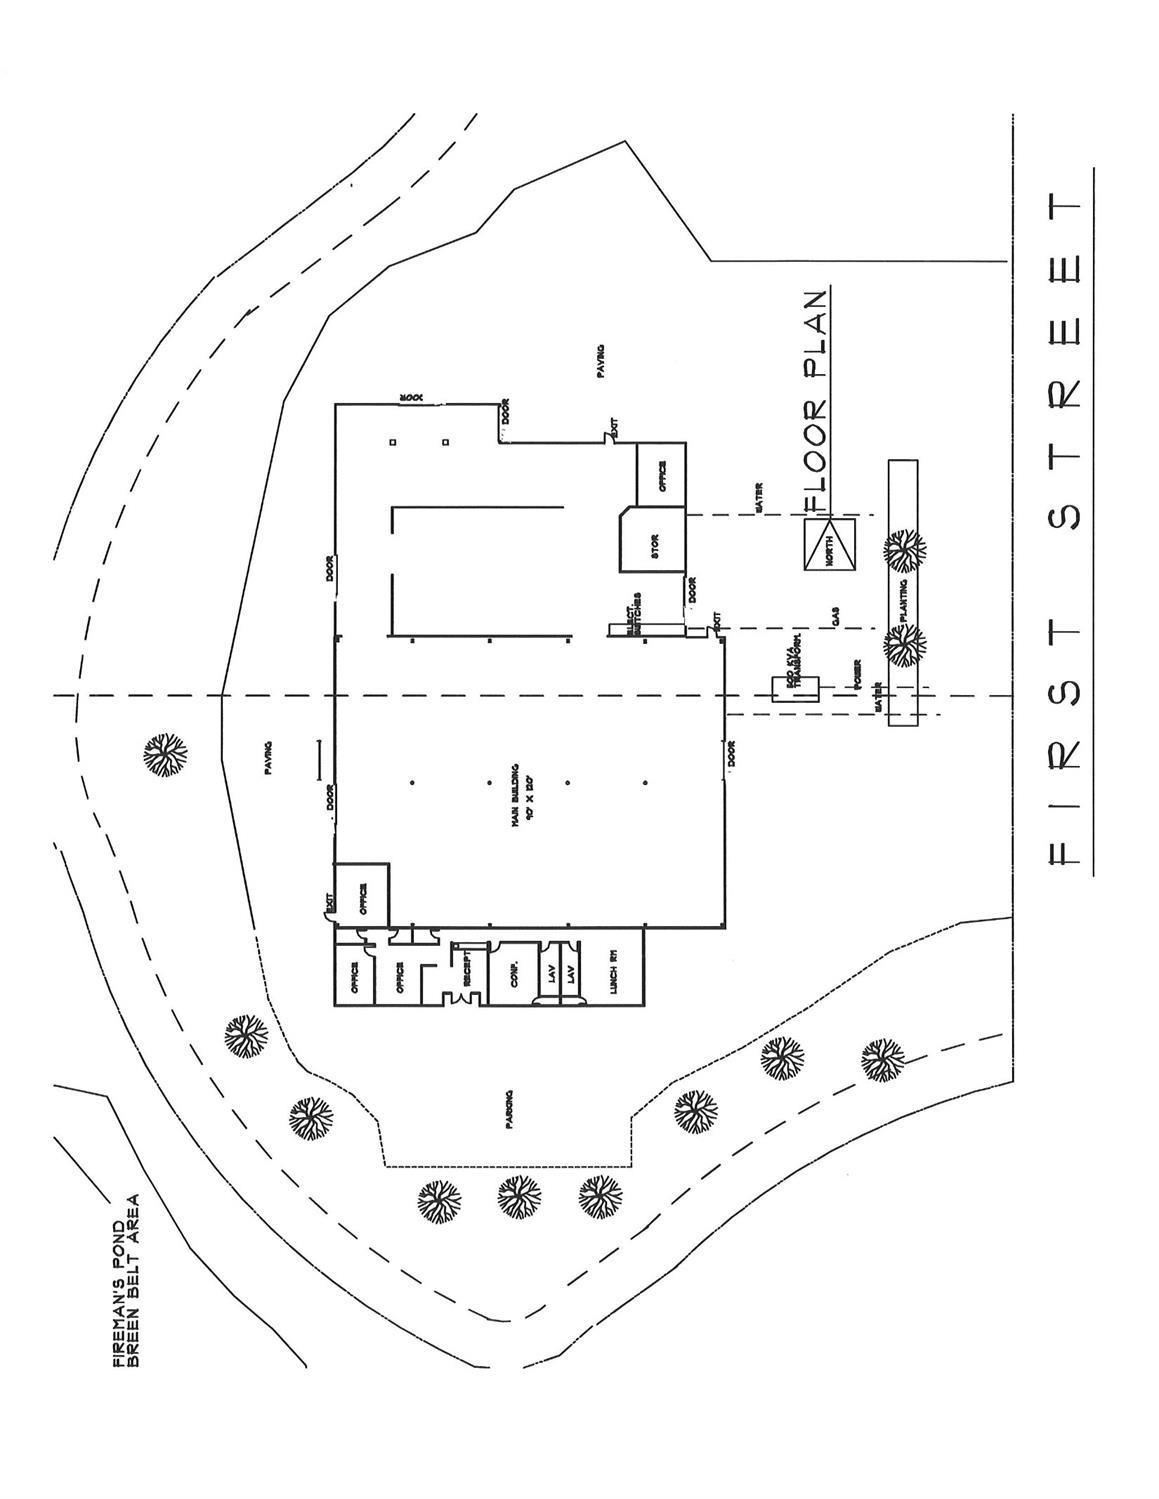 Site plan and building floorplan